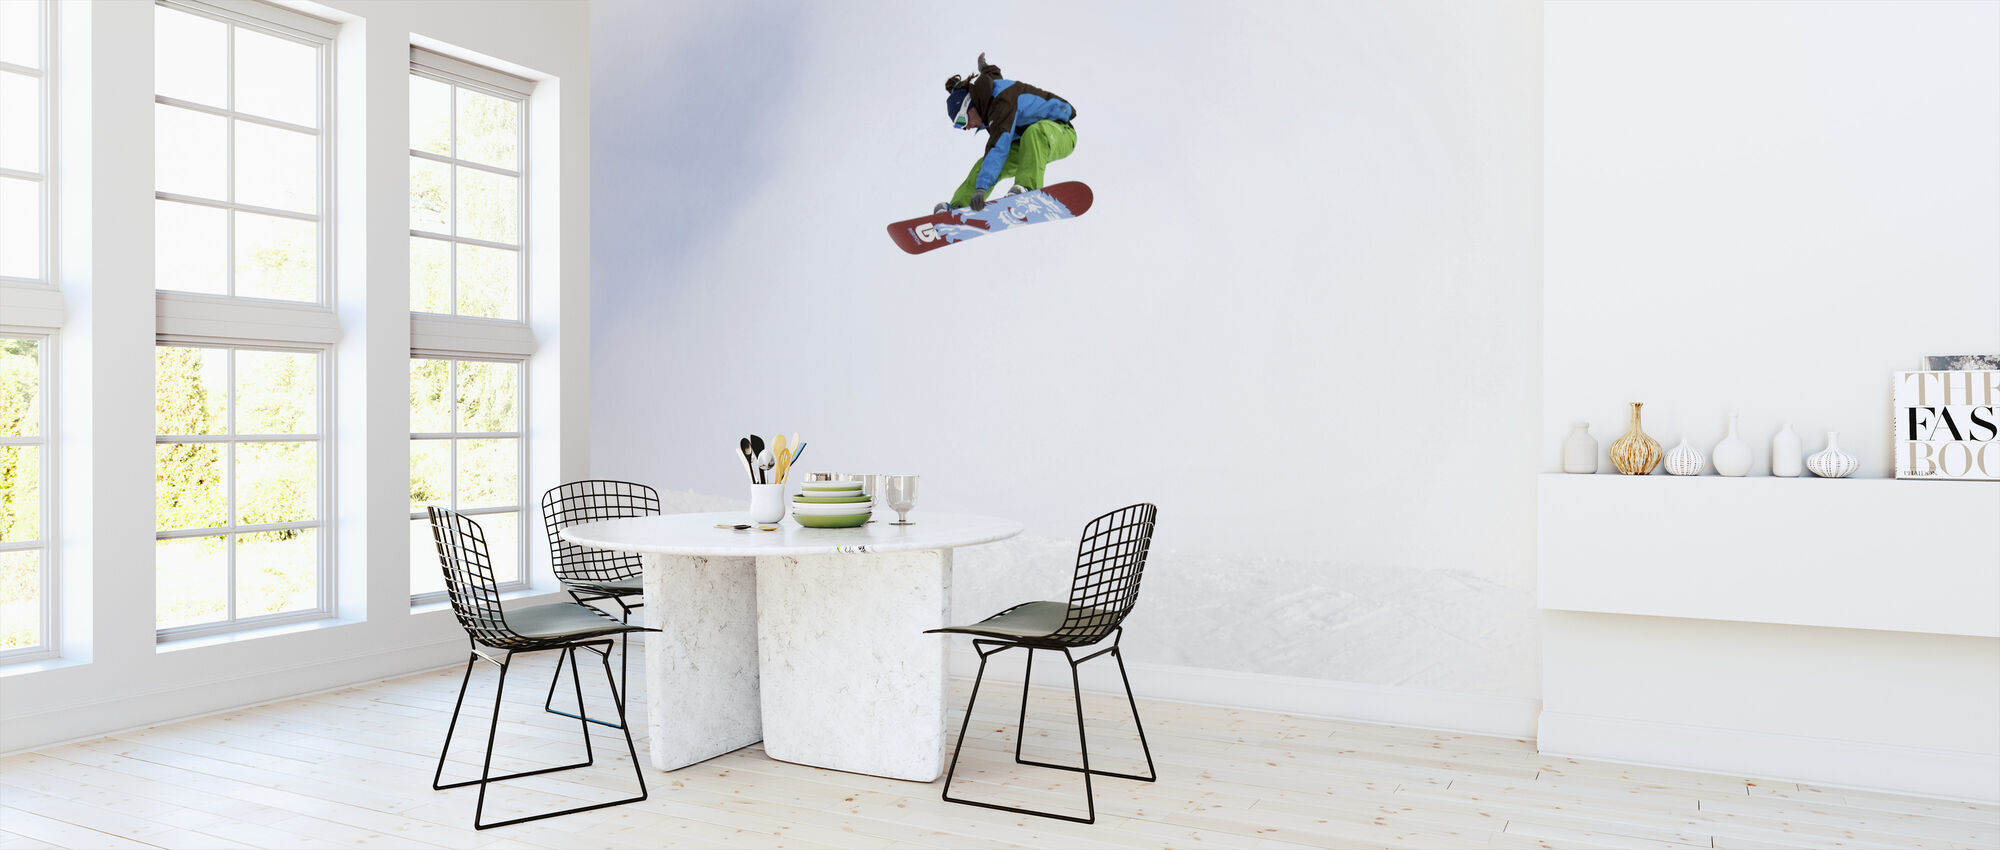 High Air Snowboarding - Wallpaper - Kitchen